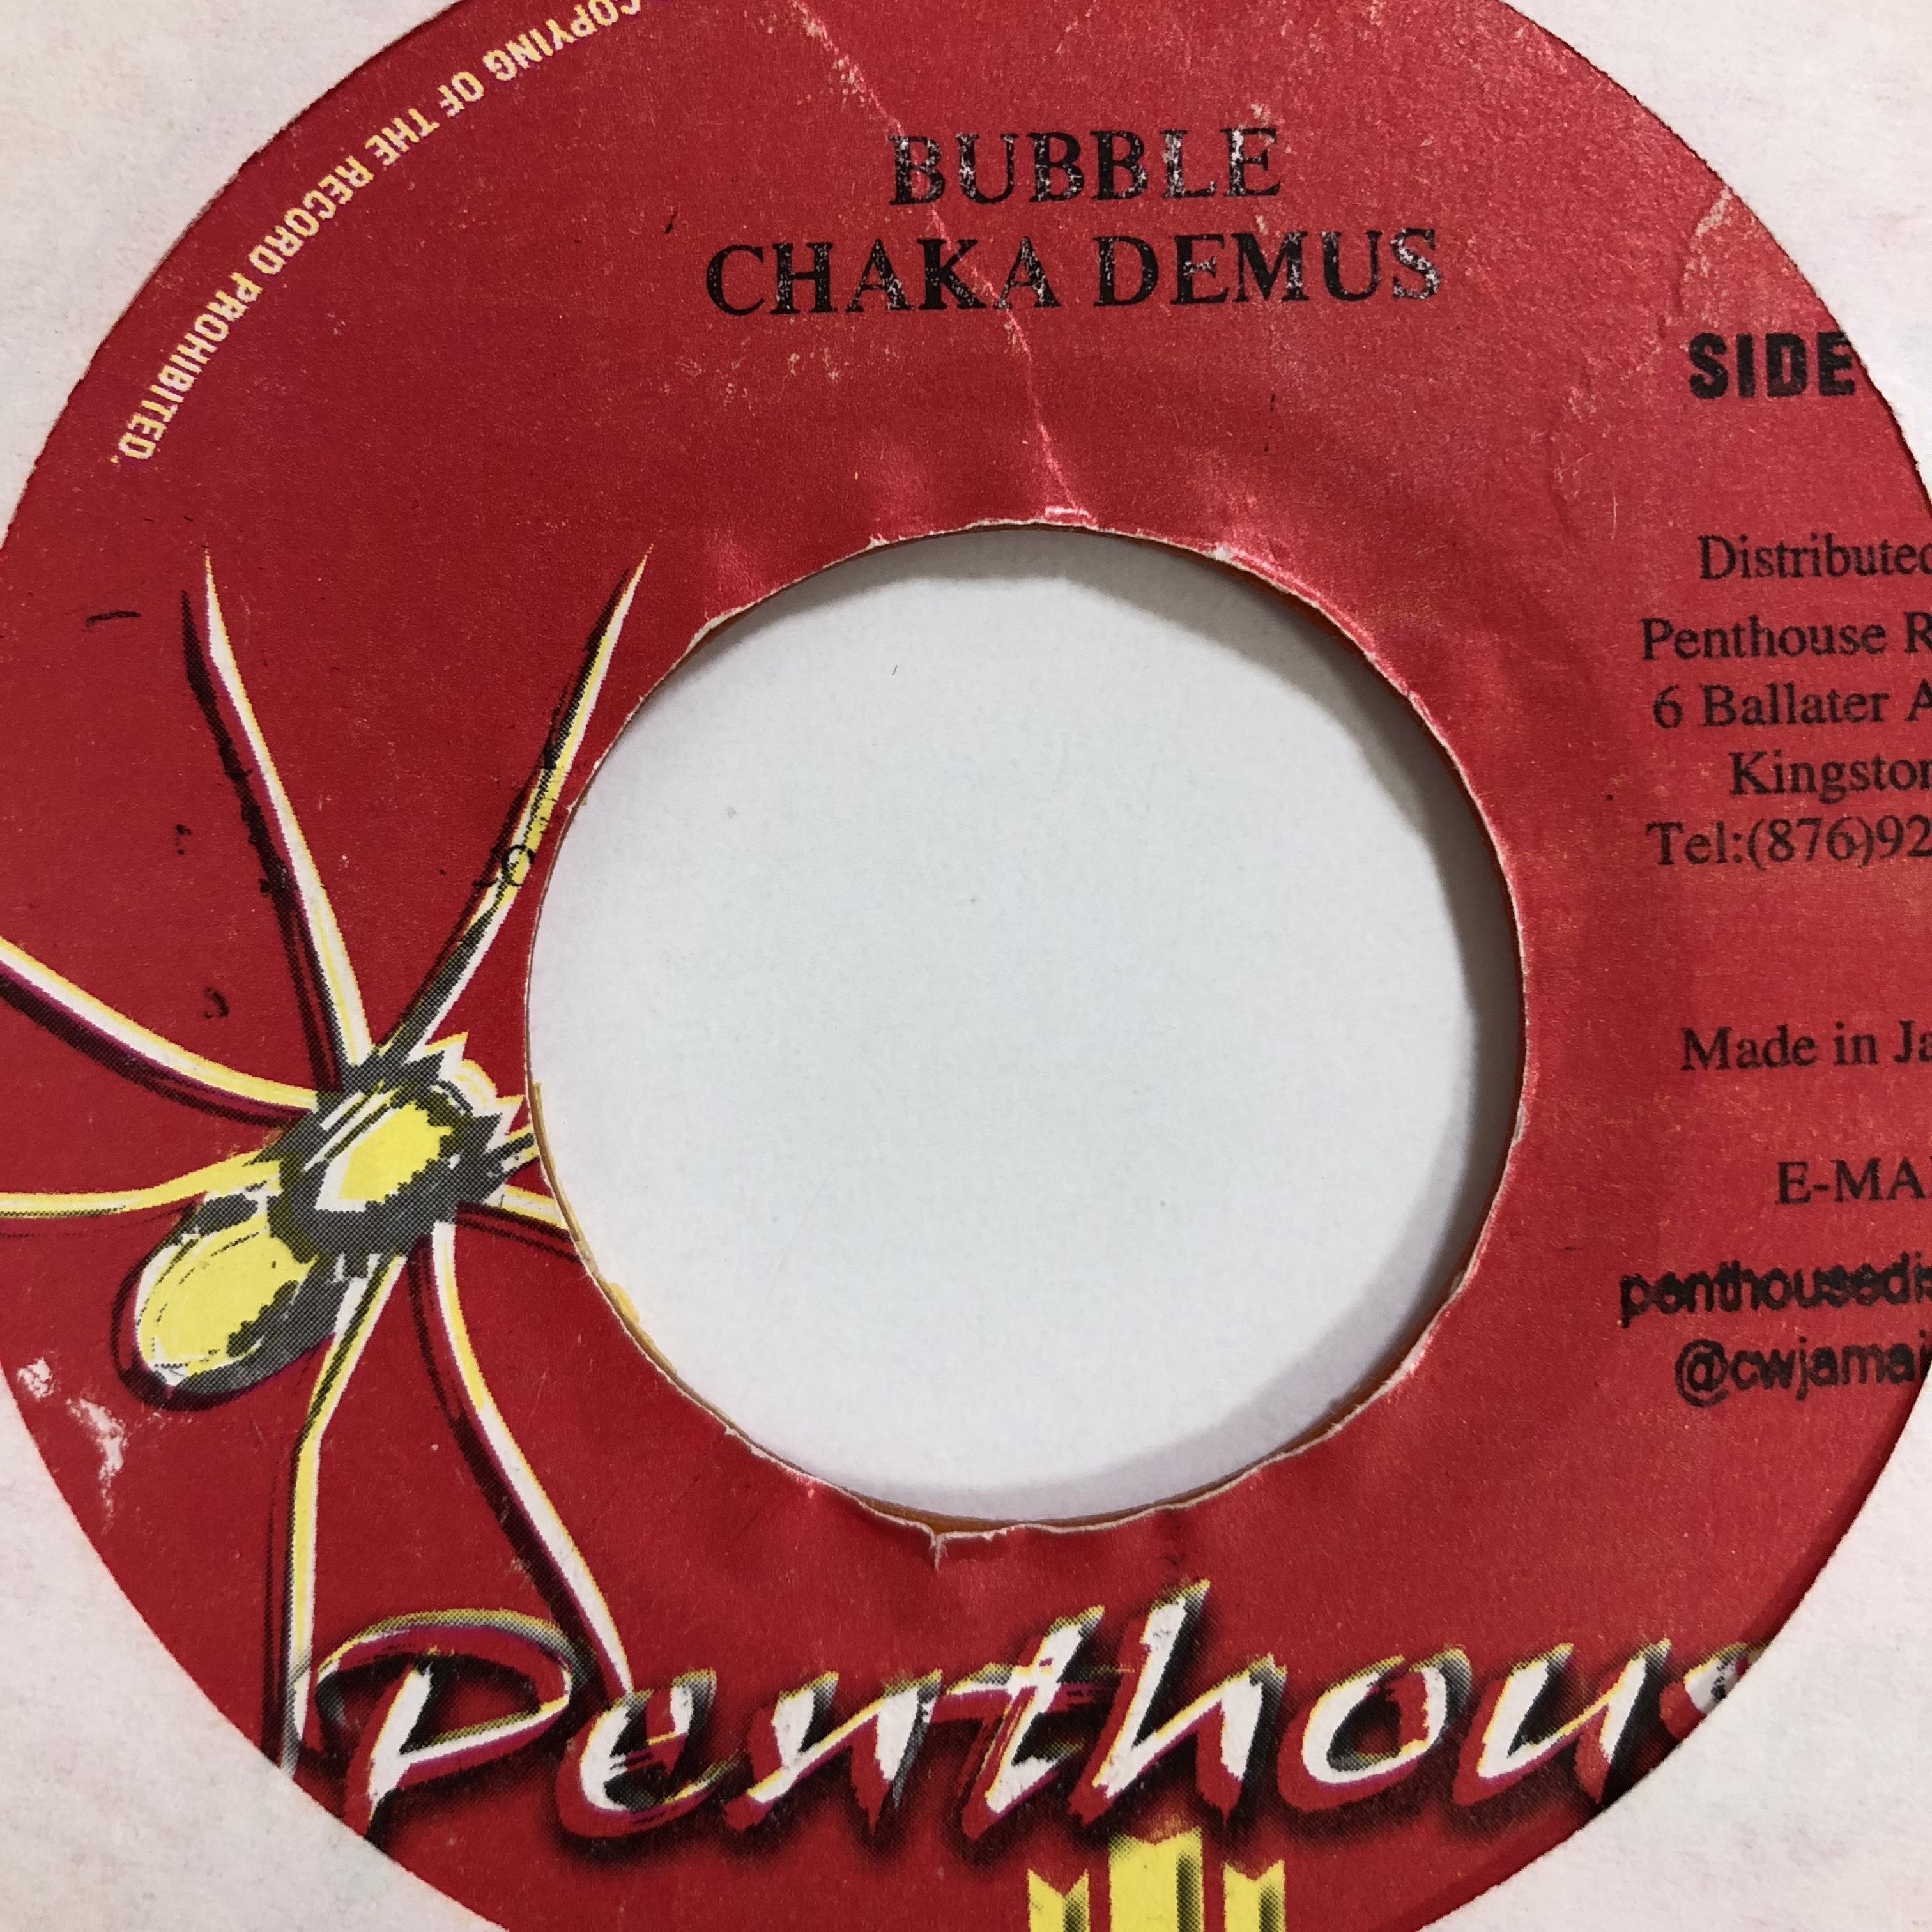 Chaka Demus(チャカデマス) - Bubble【7'】